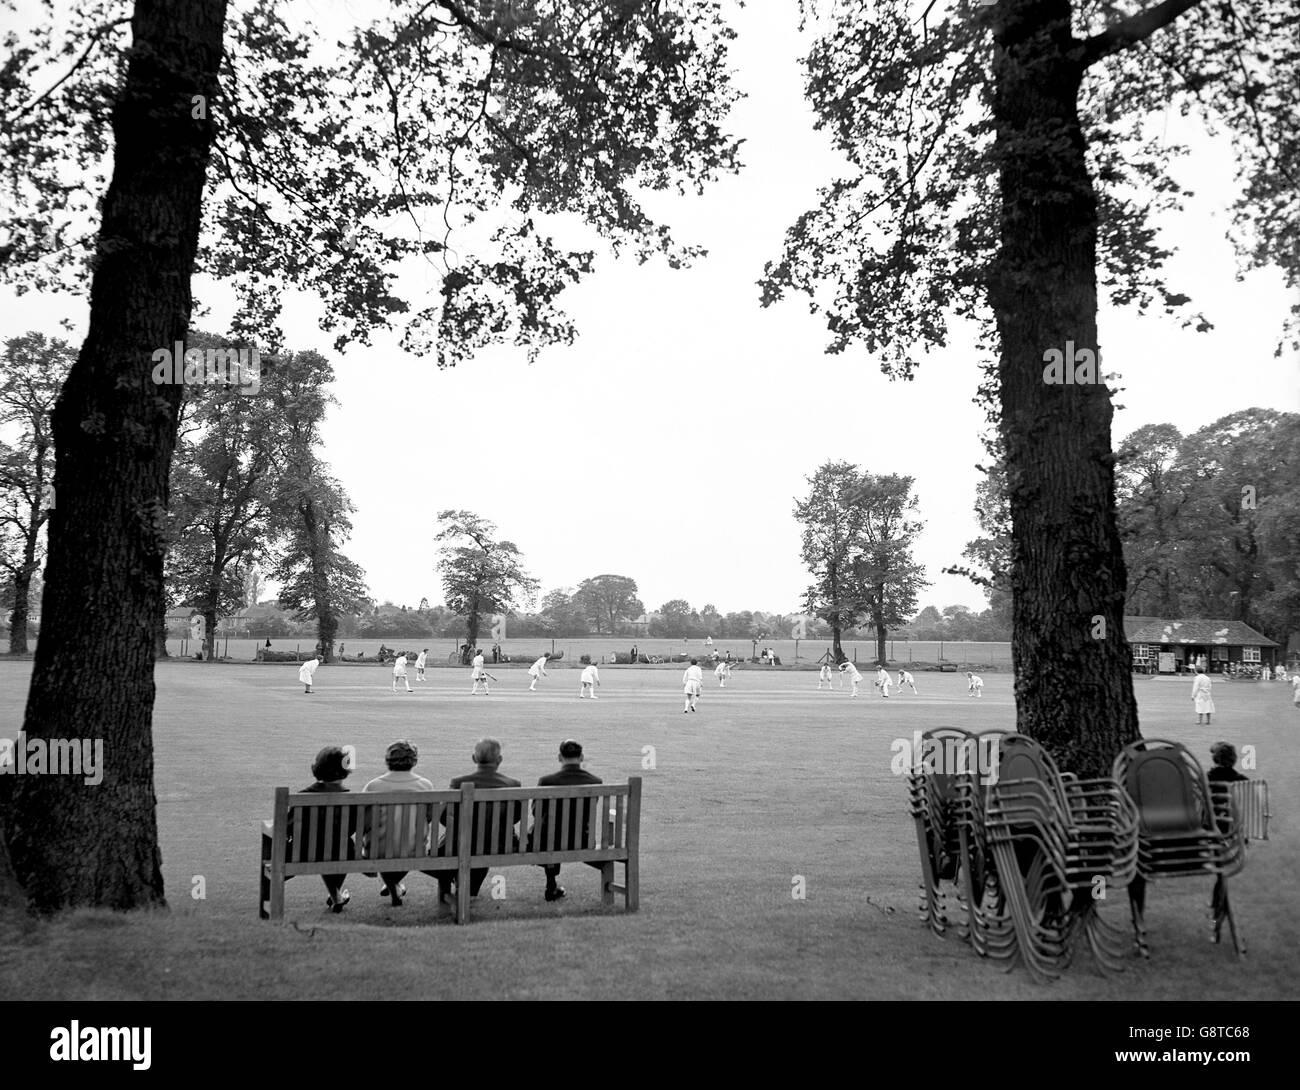 New Zealand v Middlesex - Women's Cricket - London - Stock Image